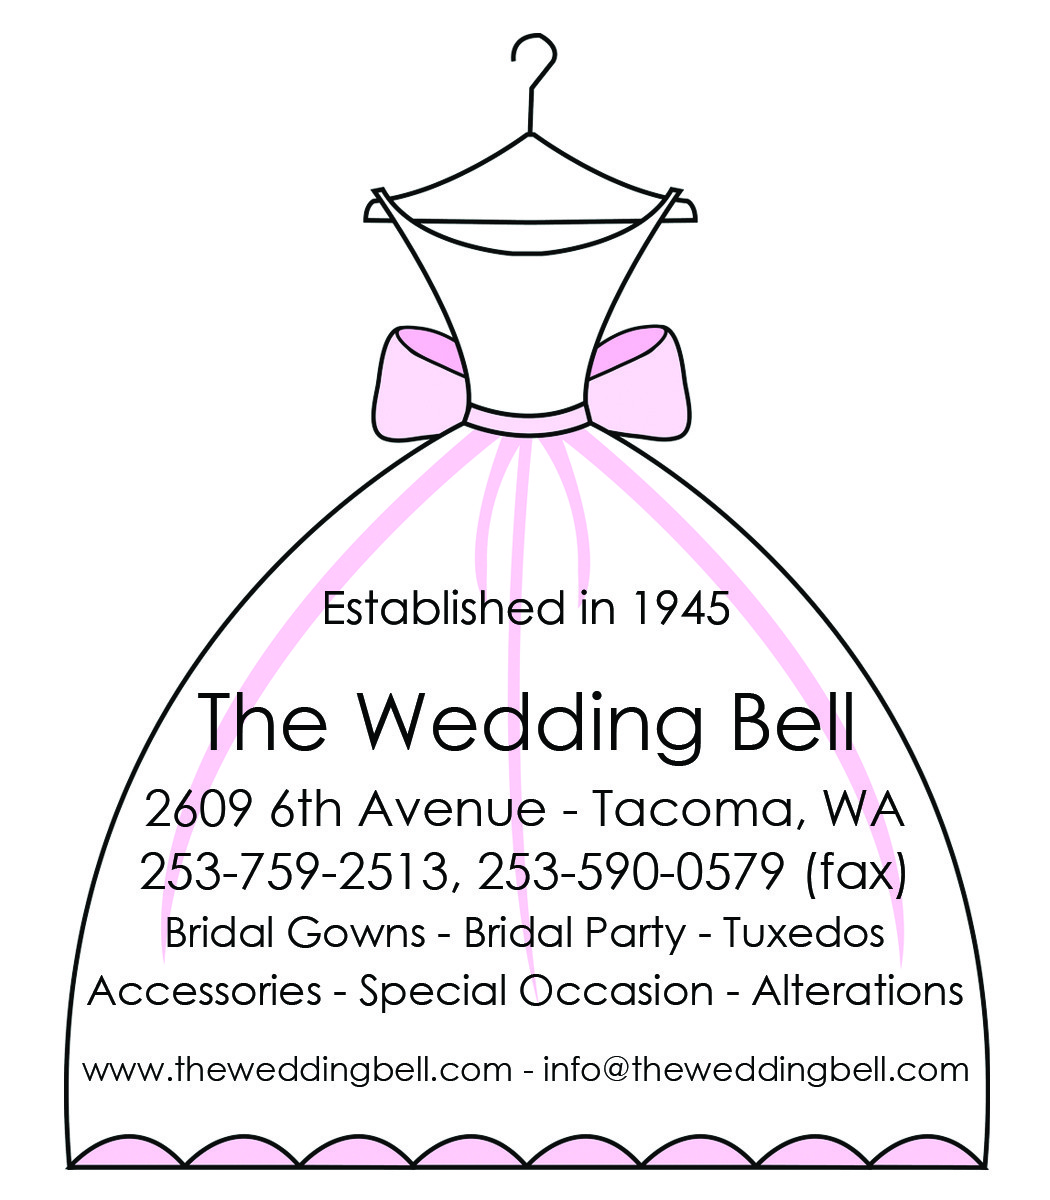 The Wedding Bell - Dress & Attire - Tacoma, WA - WeddingWire